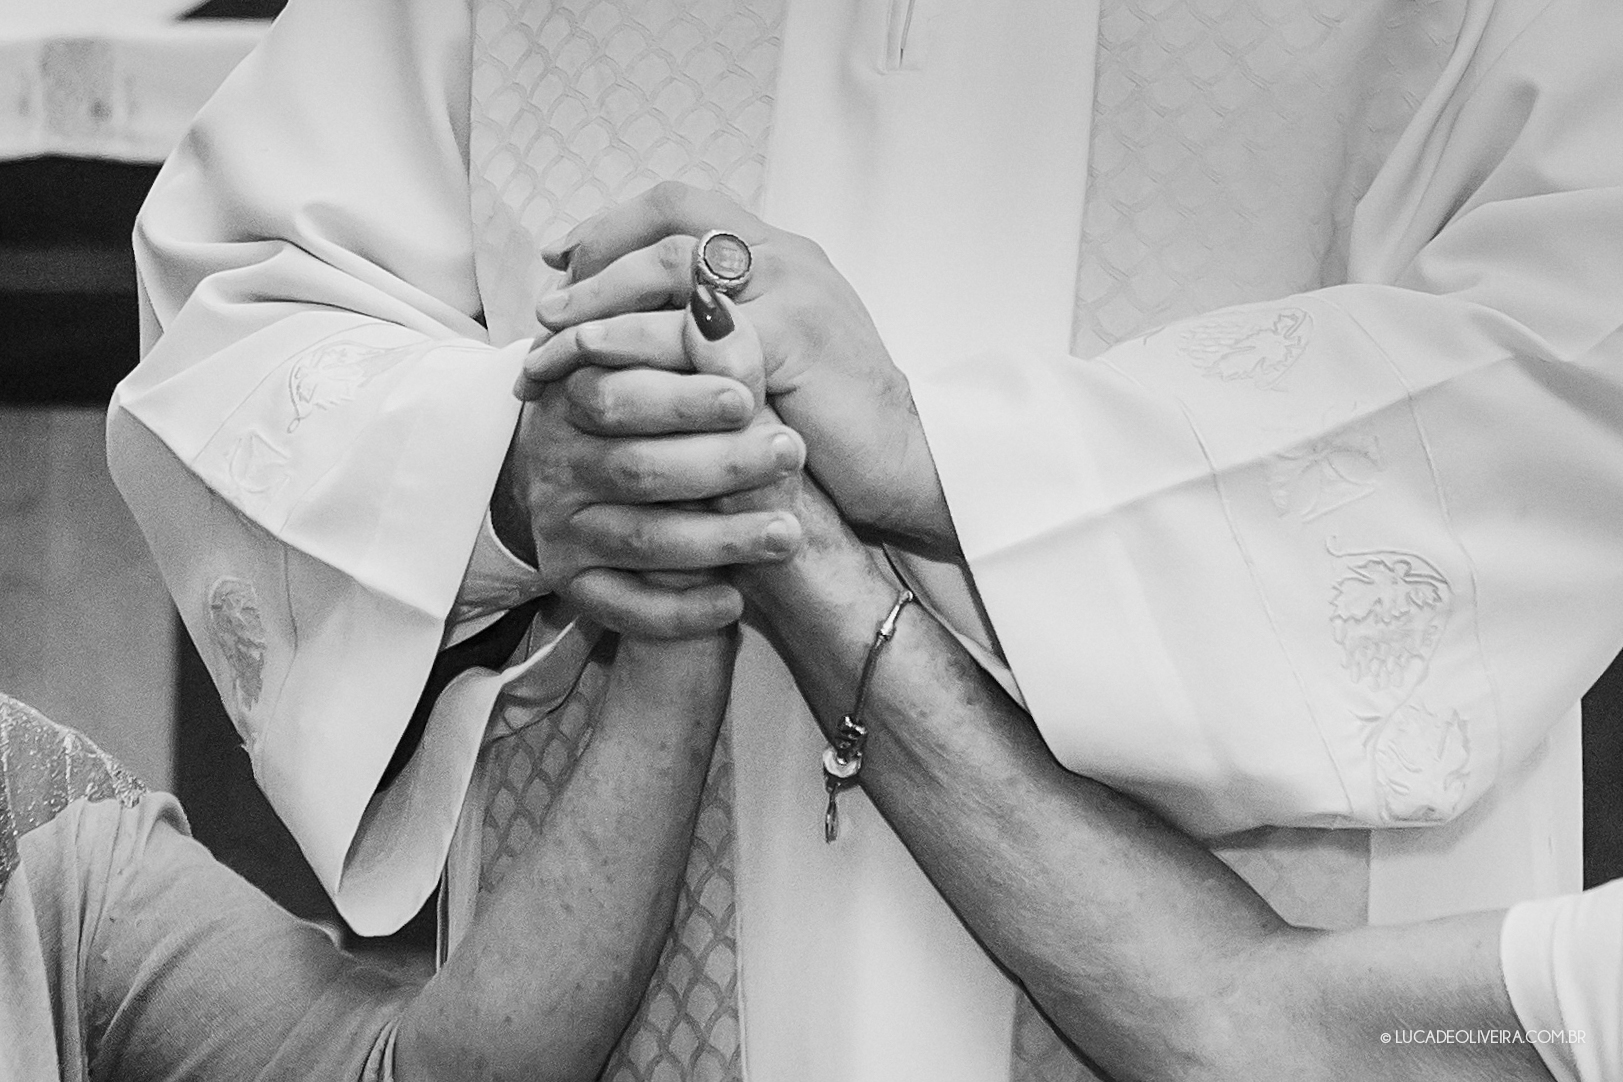 batizadosaopedorsaopaulo_lucadeoliveira_073-2